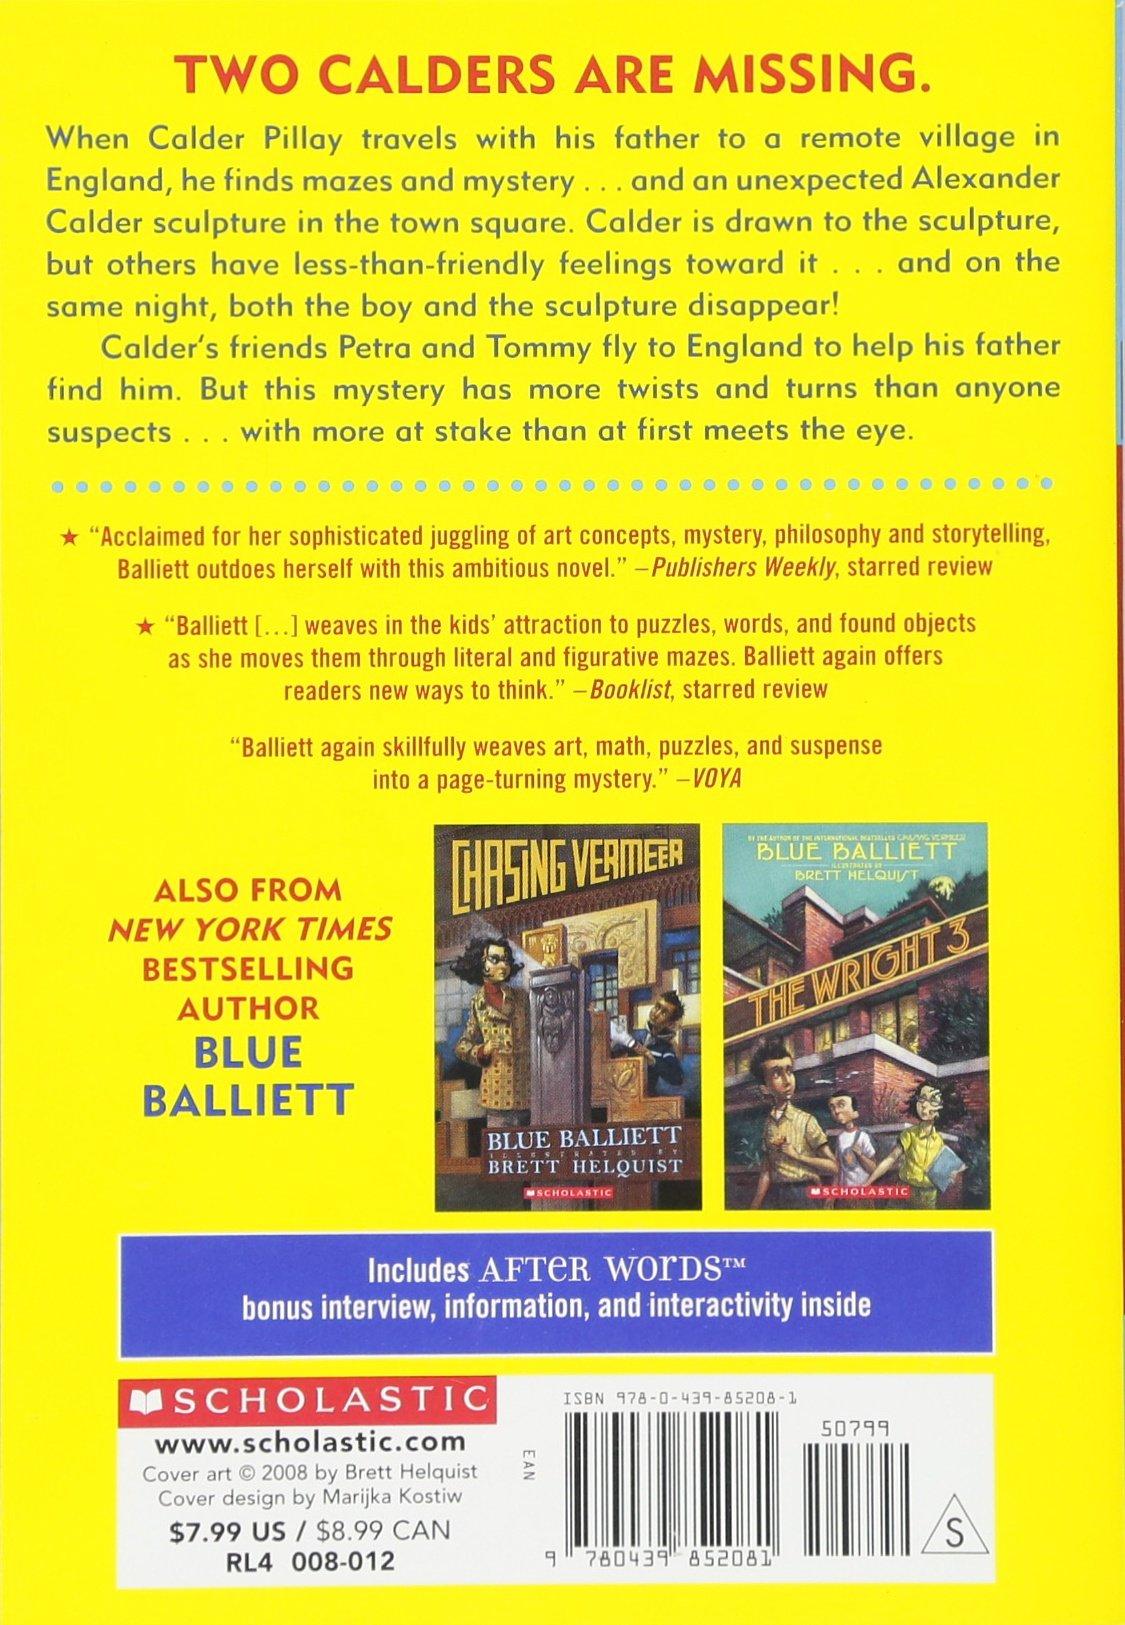 2006 scholastic entertainment inc web site copyright - The Calder Game Blue Balliett Brett Helquist 9780439852081 Amazon Com Books